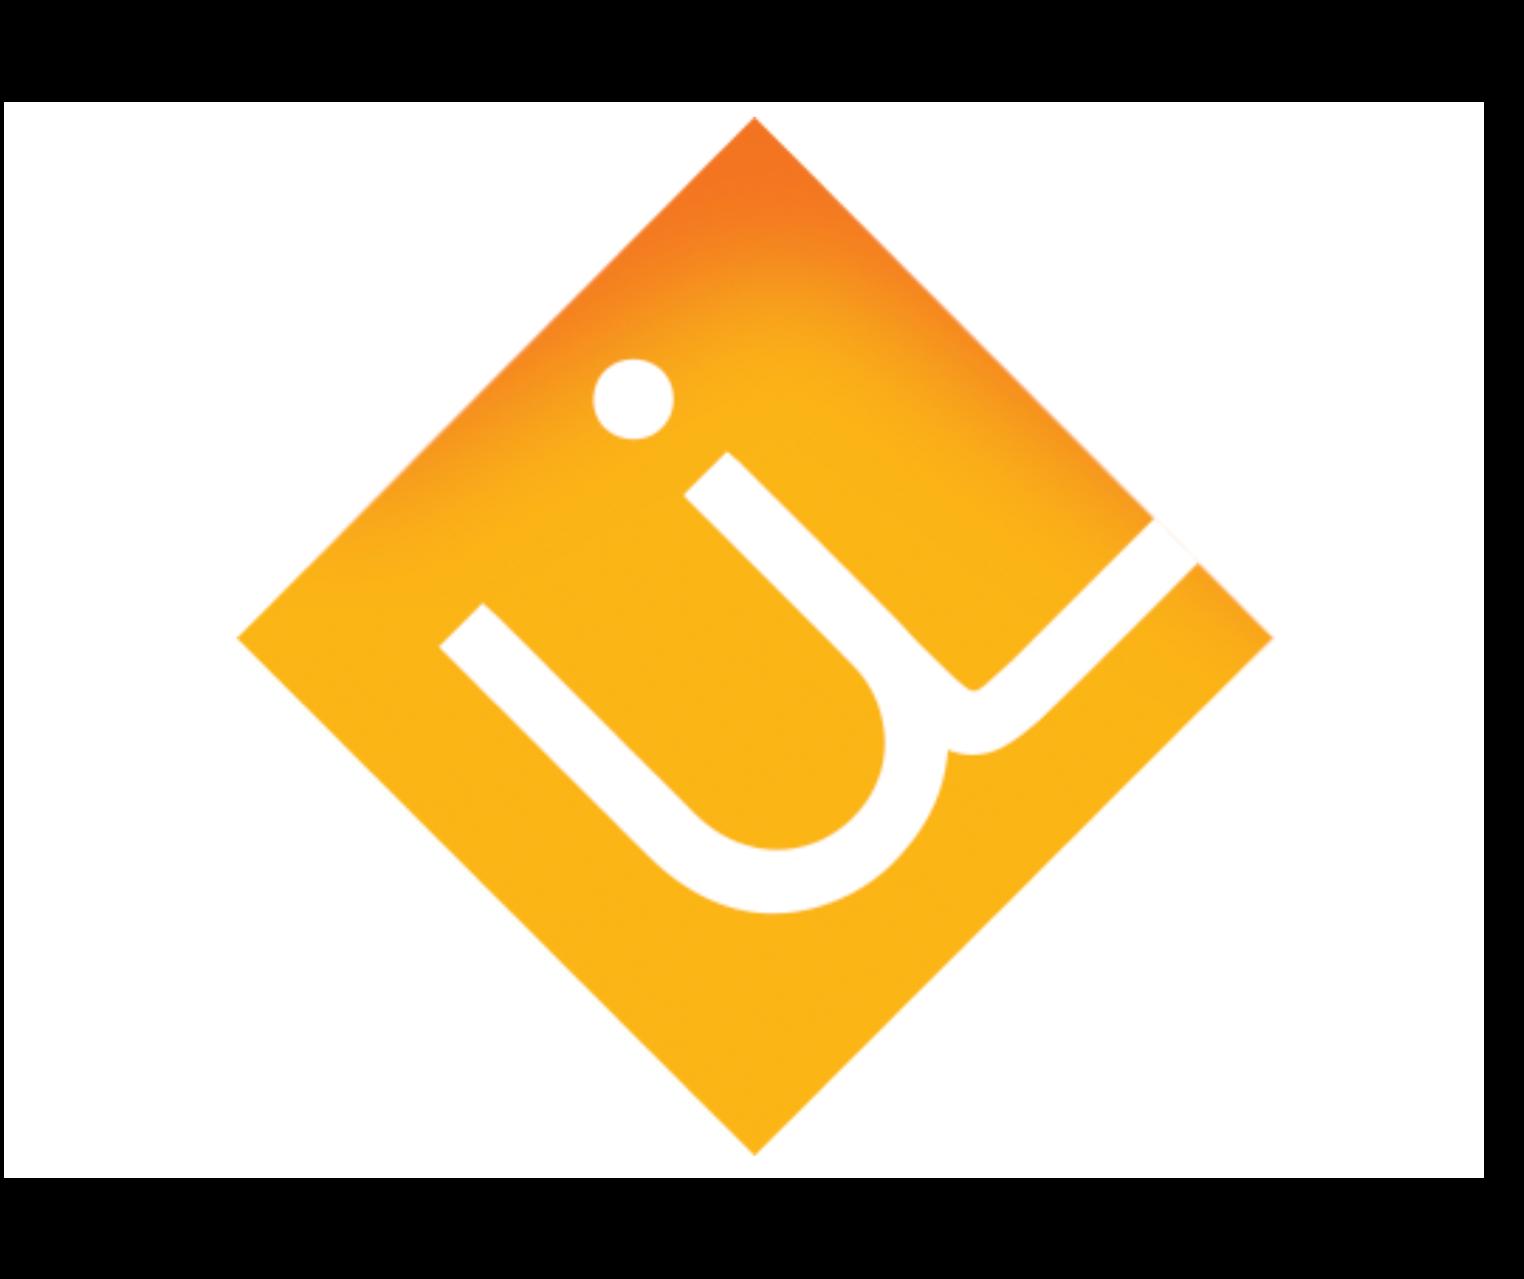 ULTRA LITHIUM